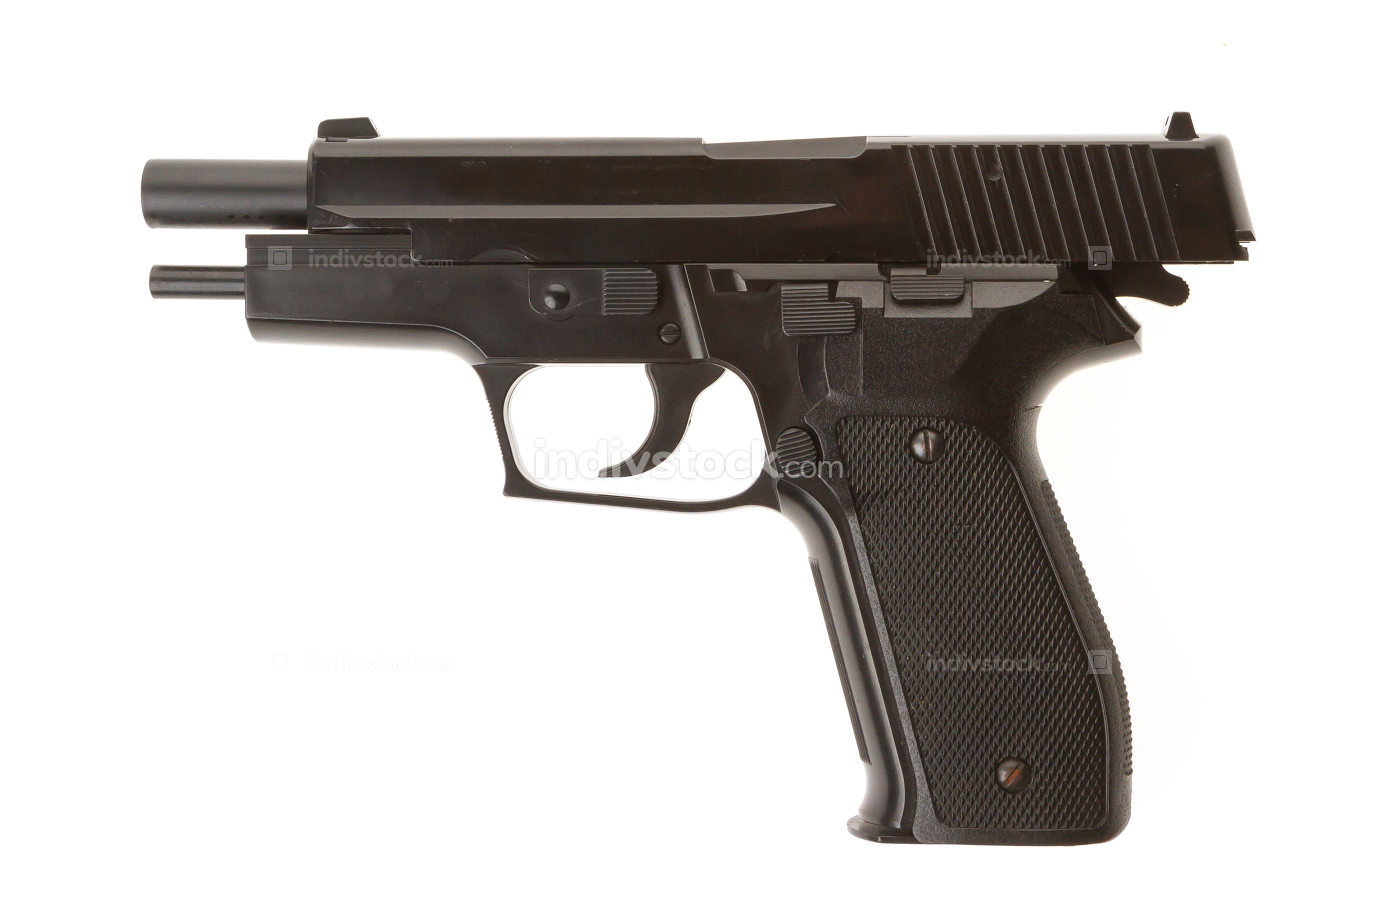 Empty semi-automatic gun isolated